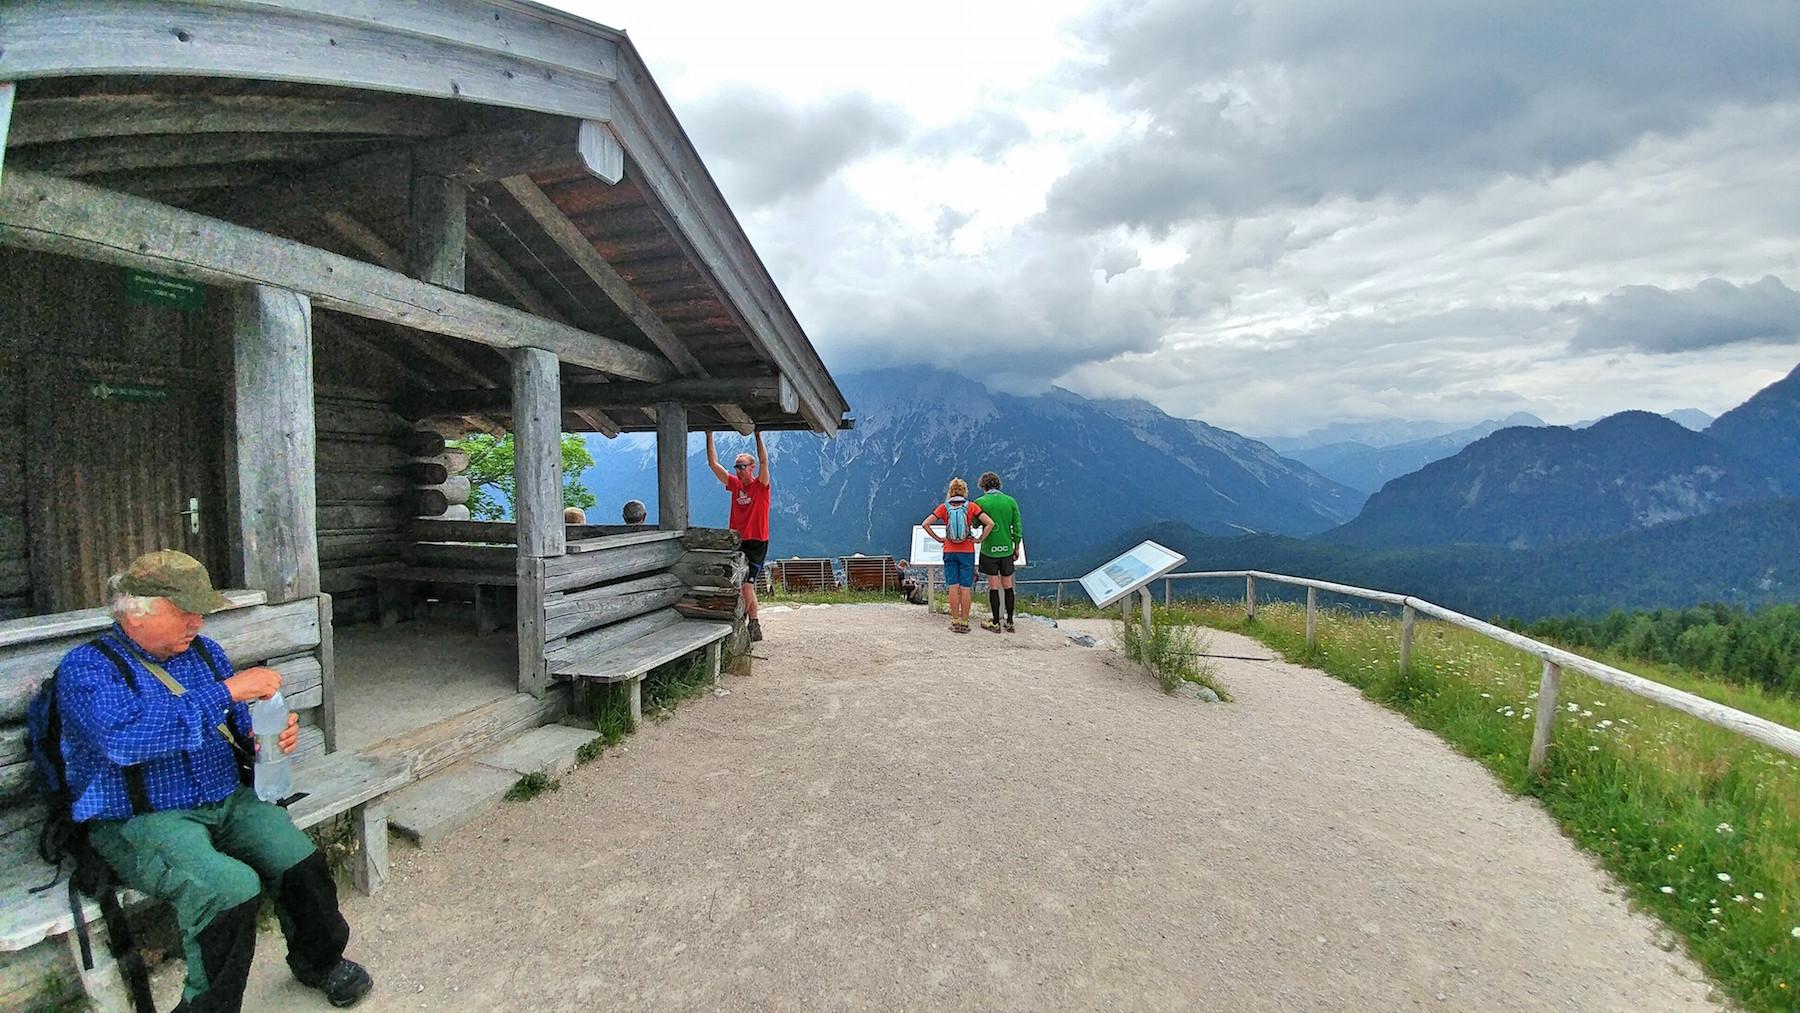 wanderung-hoher-kranzberg-mittenwald-aufstieg-besteigung-kranzberghaus-gipfel